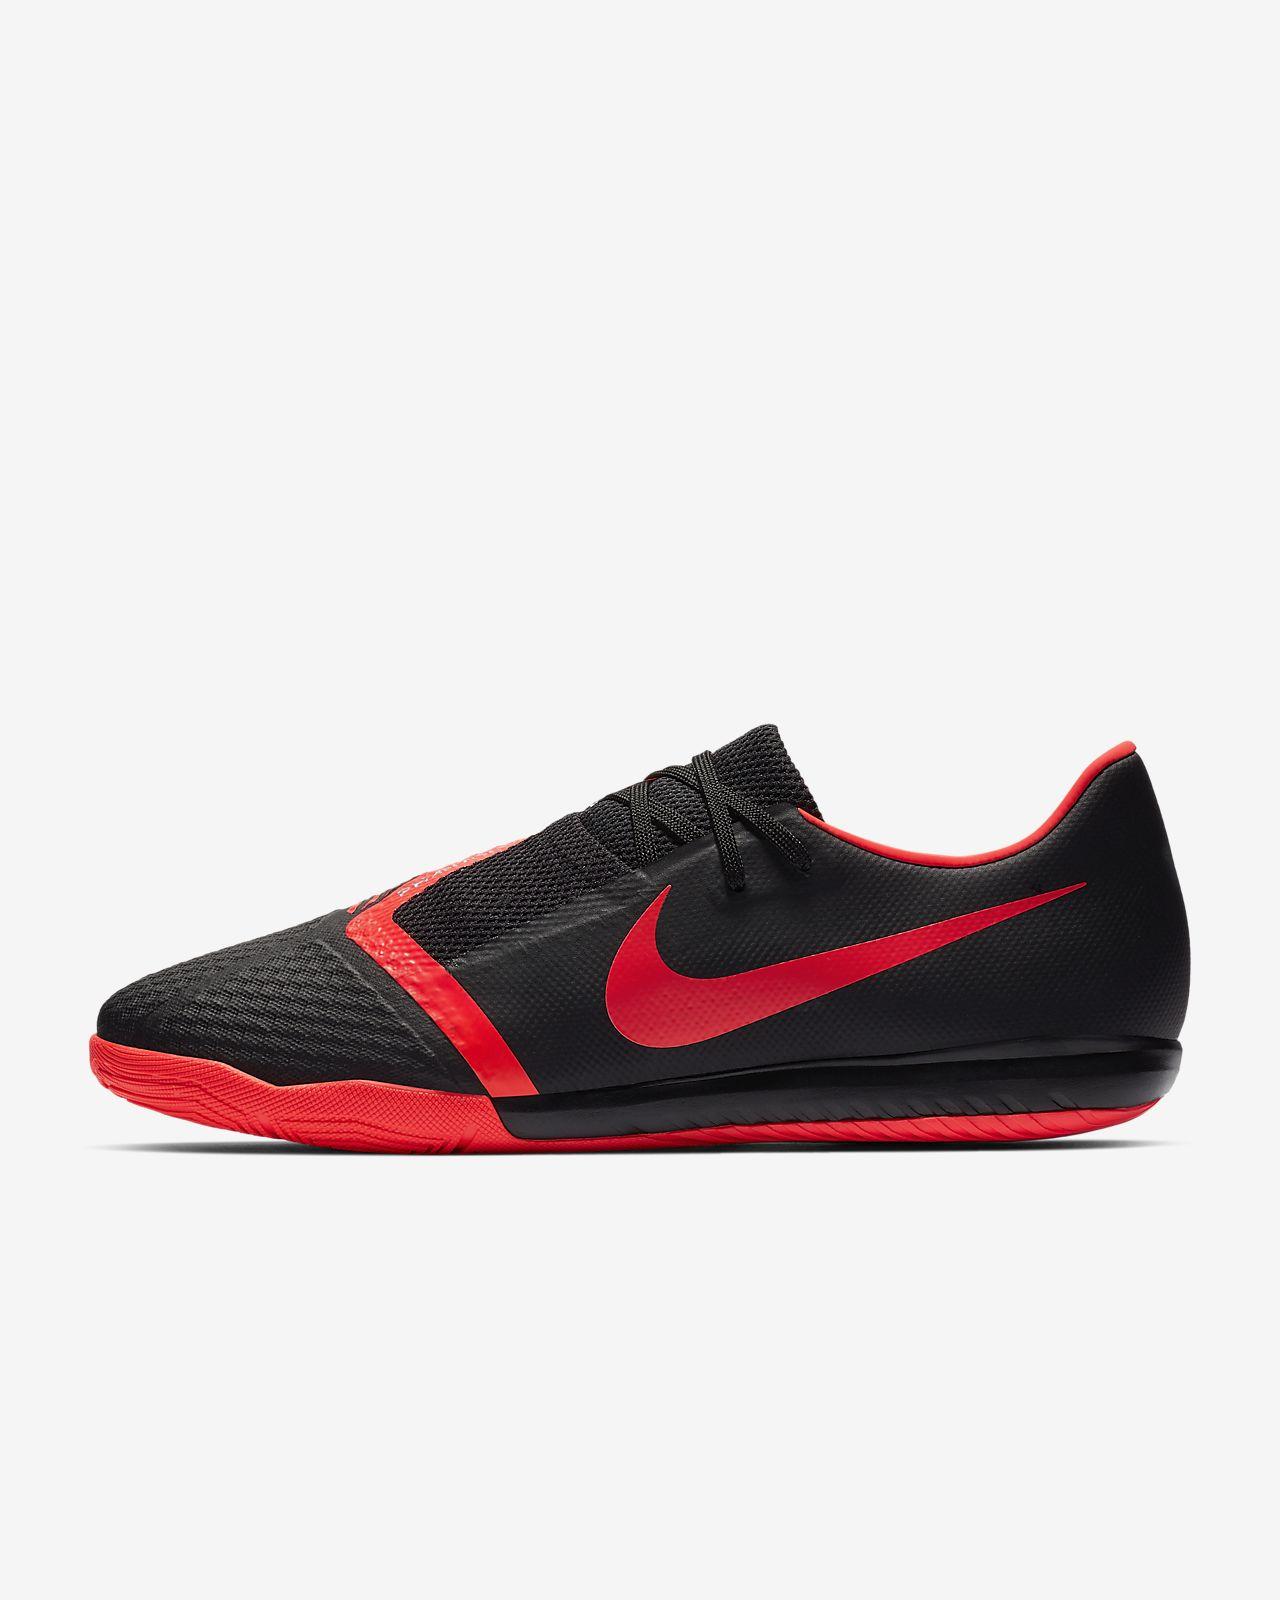 Nike Phantom Venom Academy IC Indoor/Court Soccer Cleat